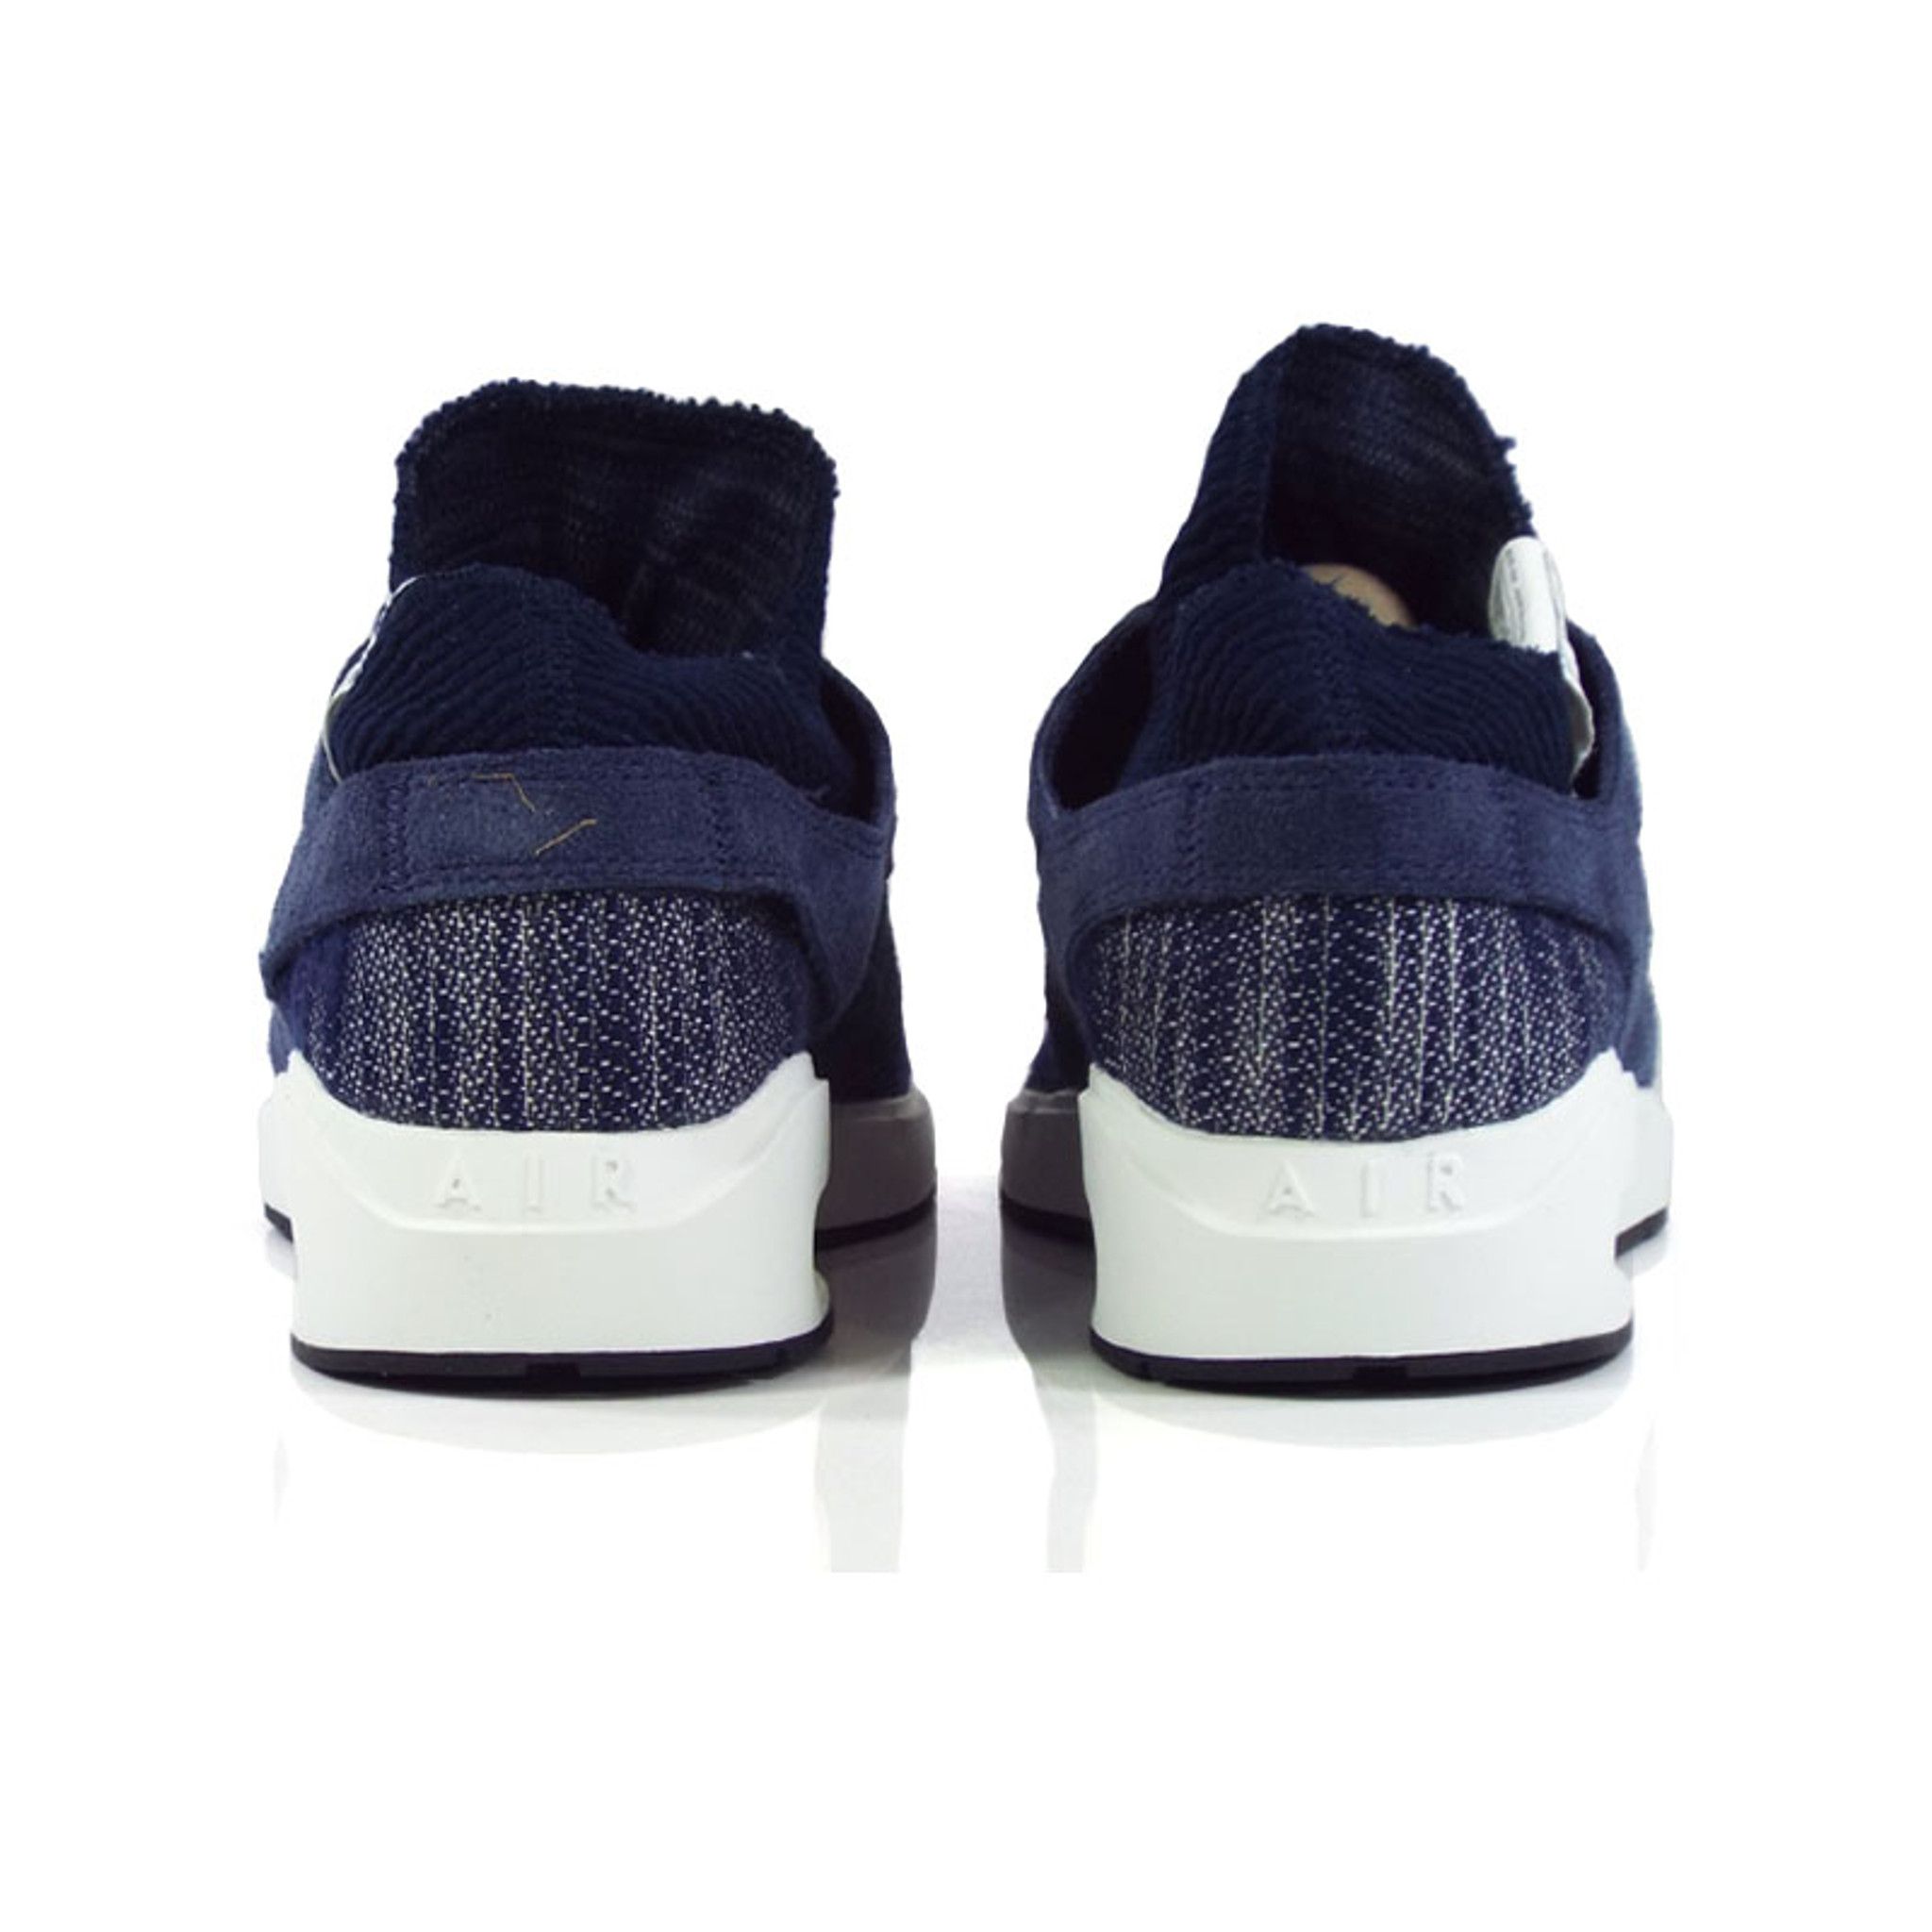 Nike SB Air Max Stefan Janoski 2 Premium Shoes Obsidian